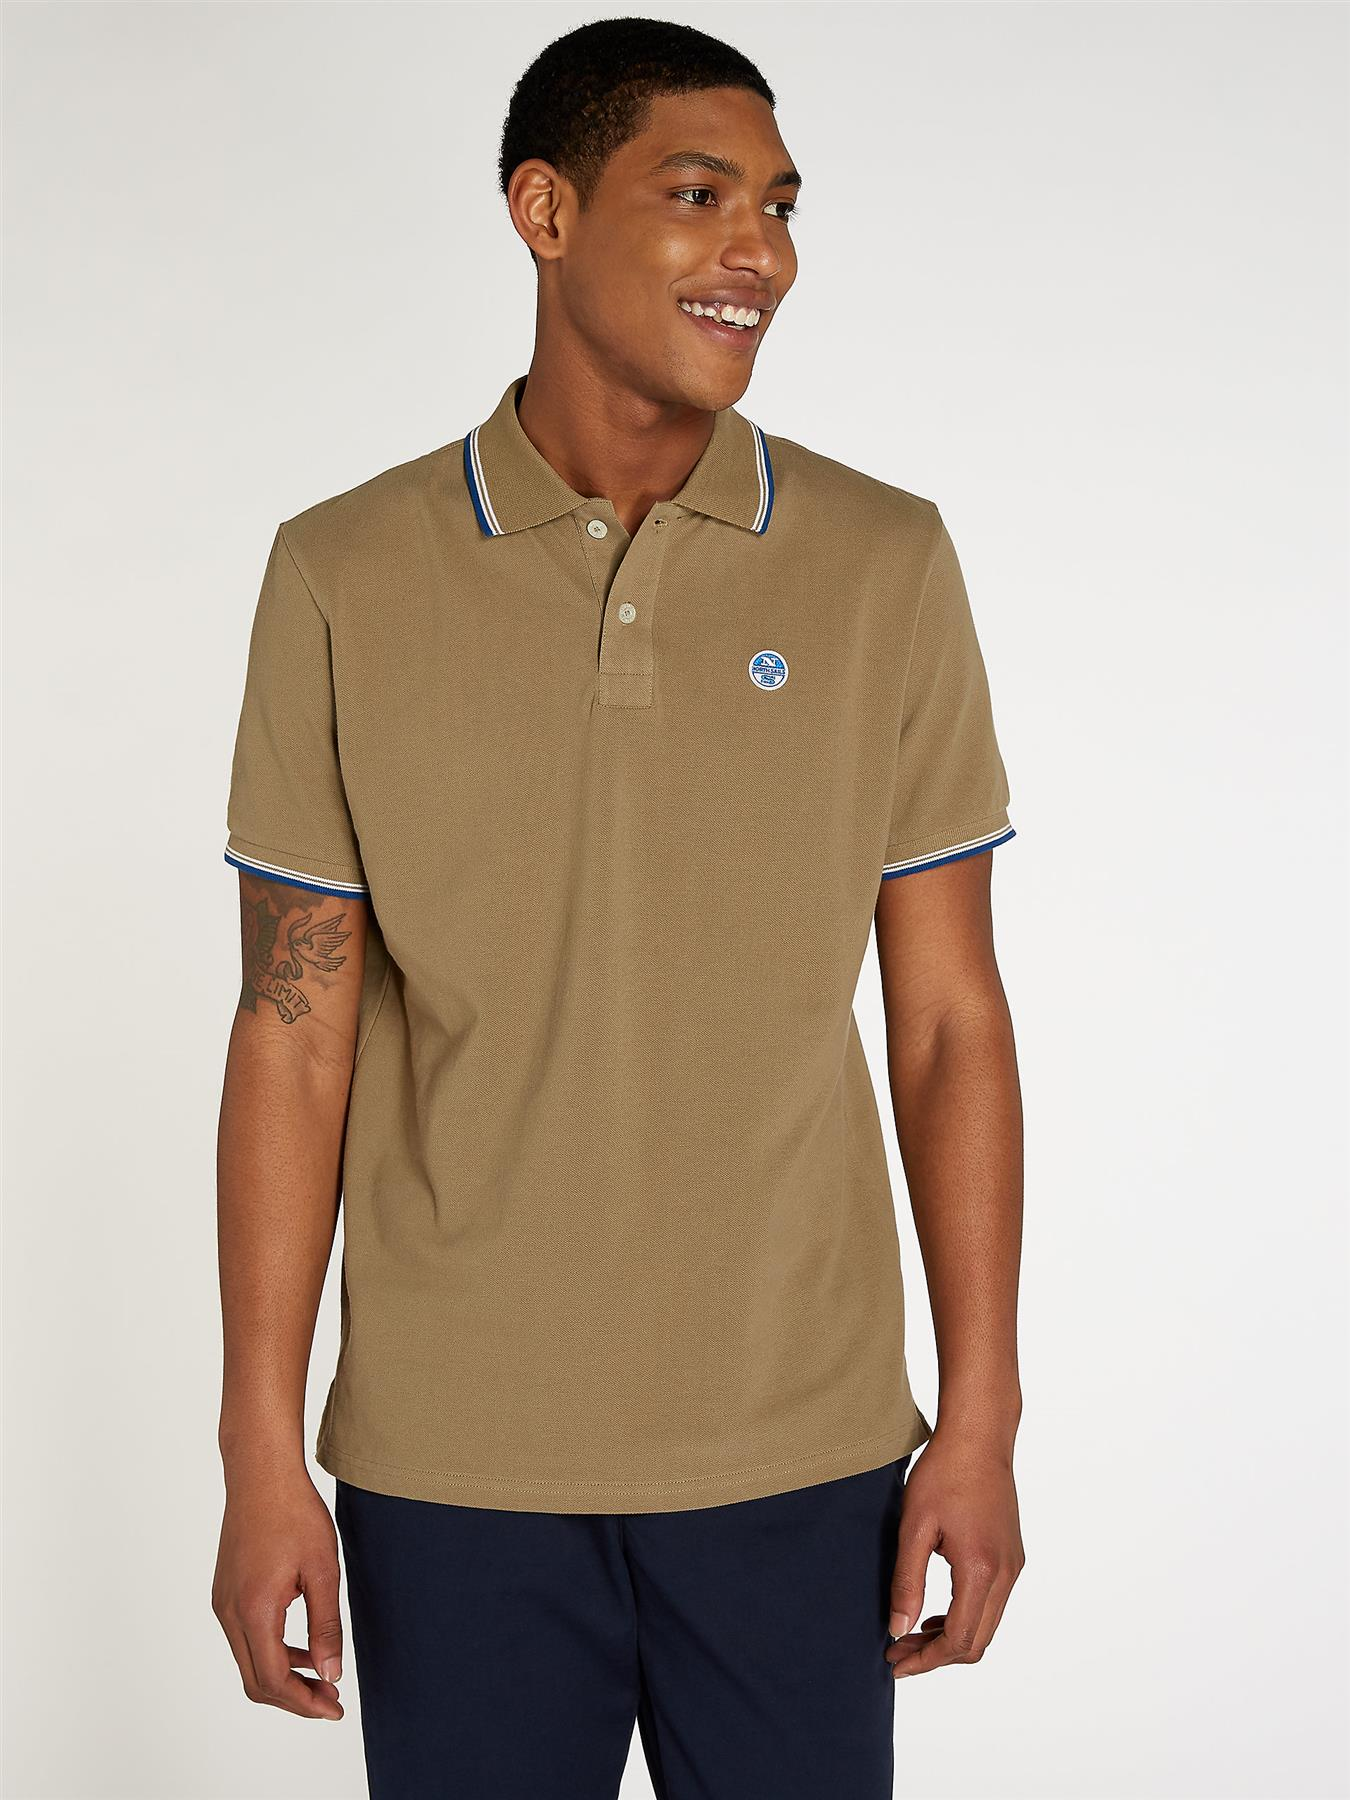 NEW-North-Sails-Legacy-Heritage-Mens-Cotton-Polo-Shirt-Top-Size-S-M-L-XL-XXL-3XL thumbnail 23